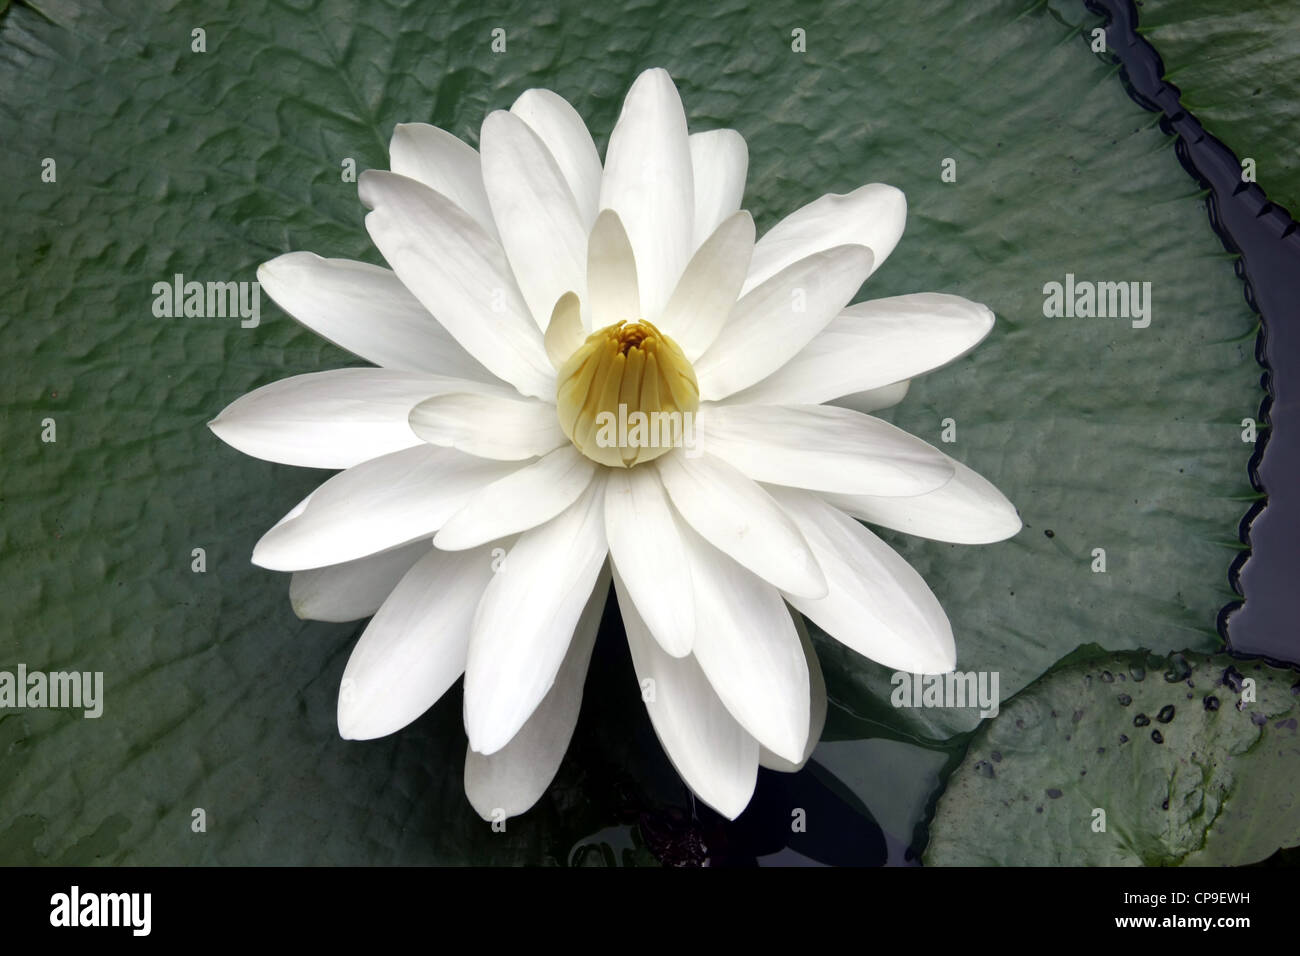 Lotus flower stock photos lotus flower stock images alamy lotus flower in full bloom in phuket thailand stock image izmirmasajfo